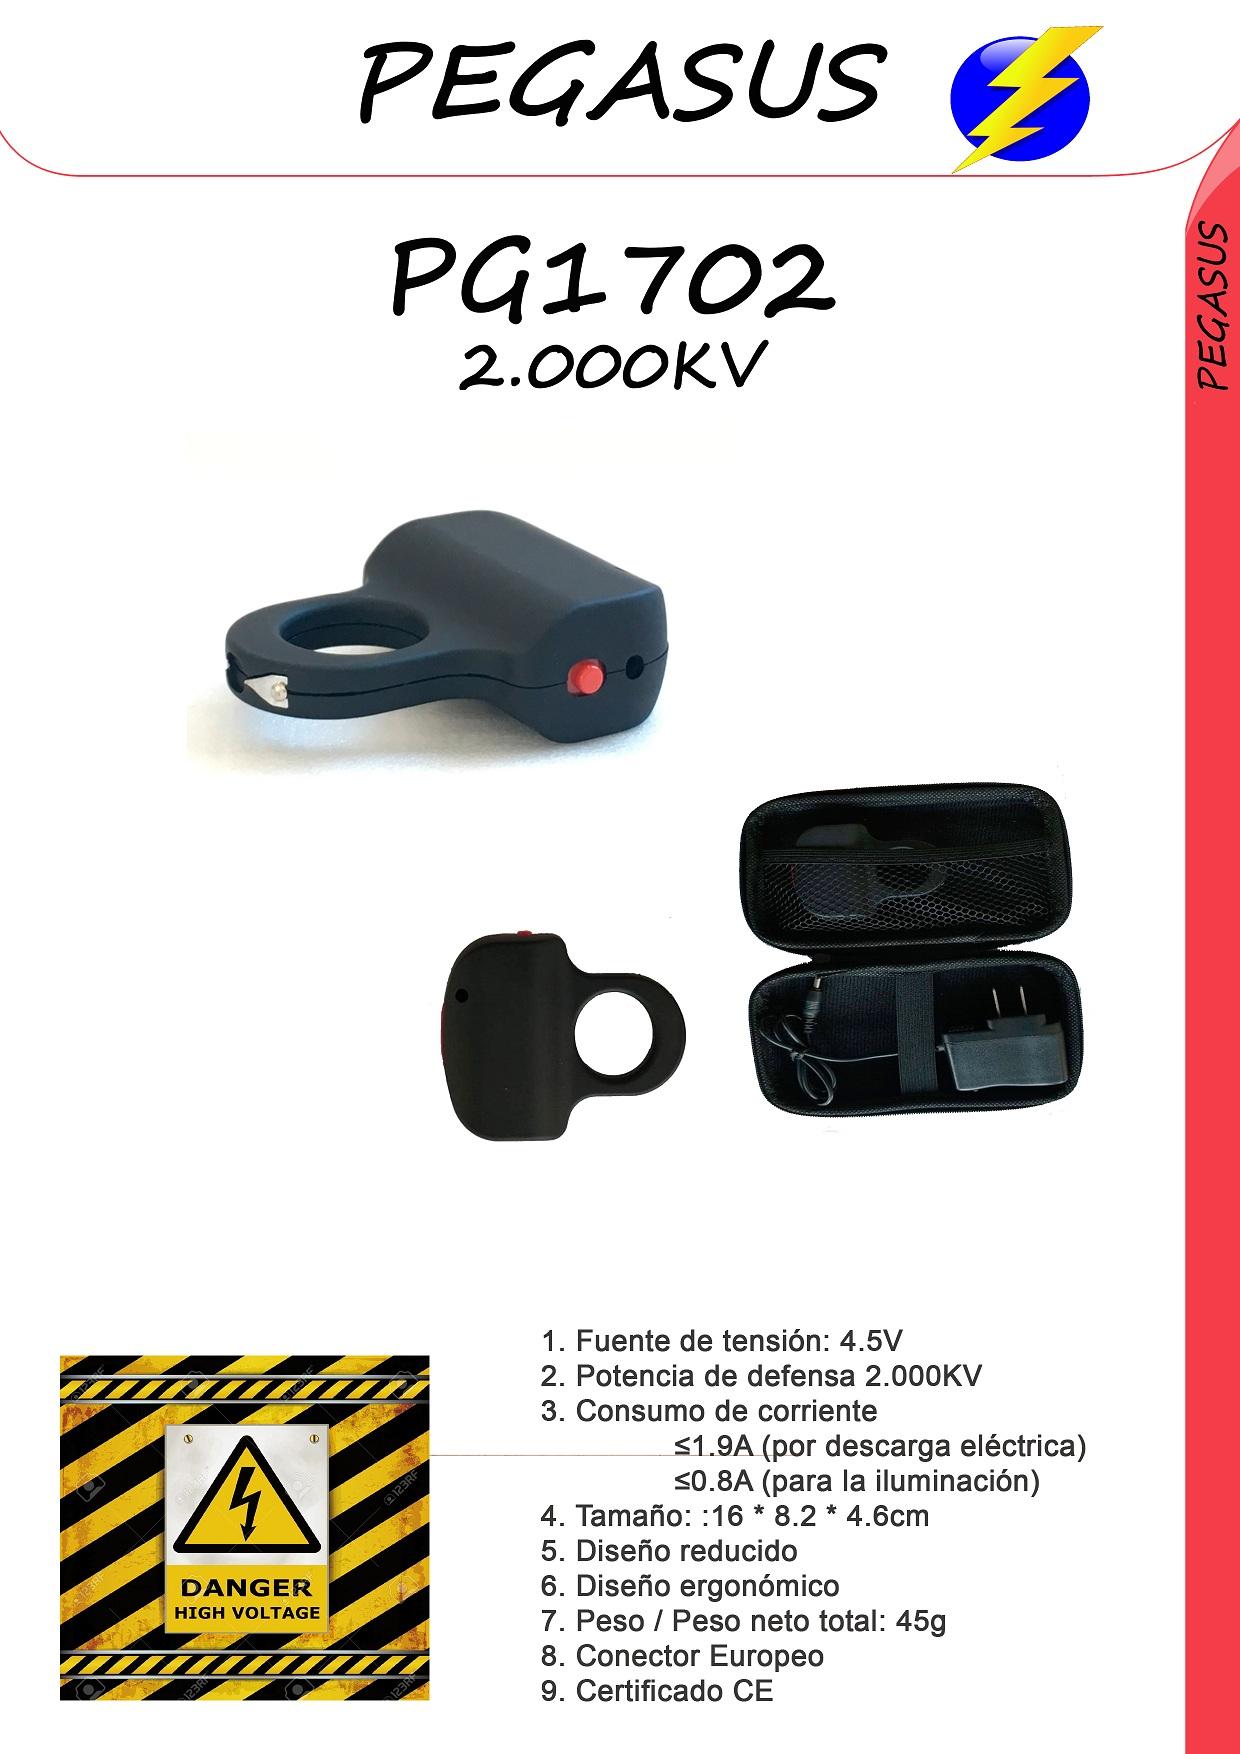 PEGASUS PG1702 2.000KV